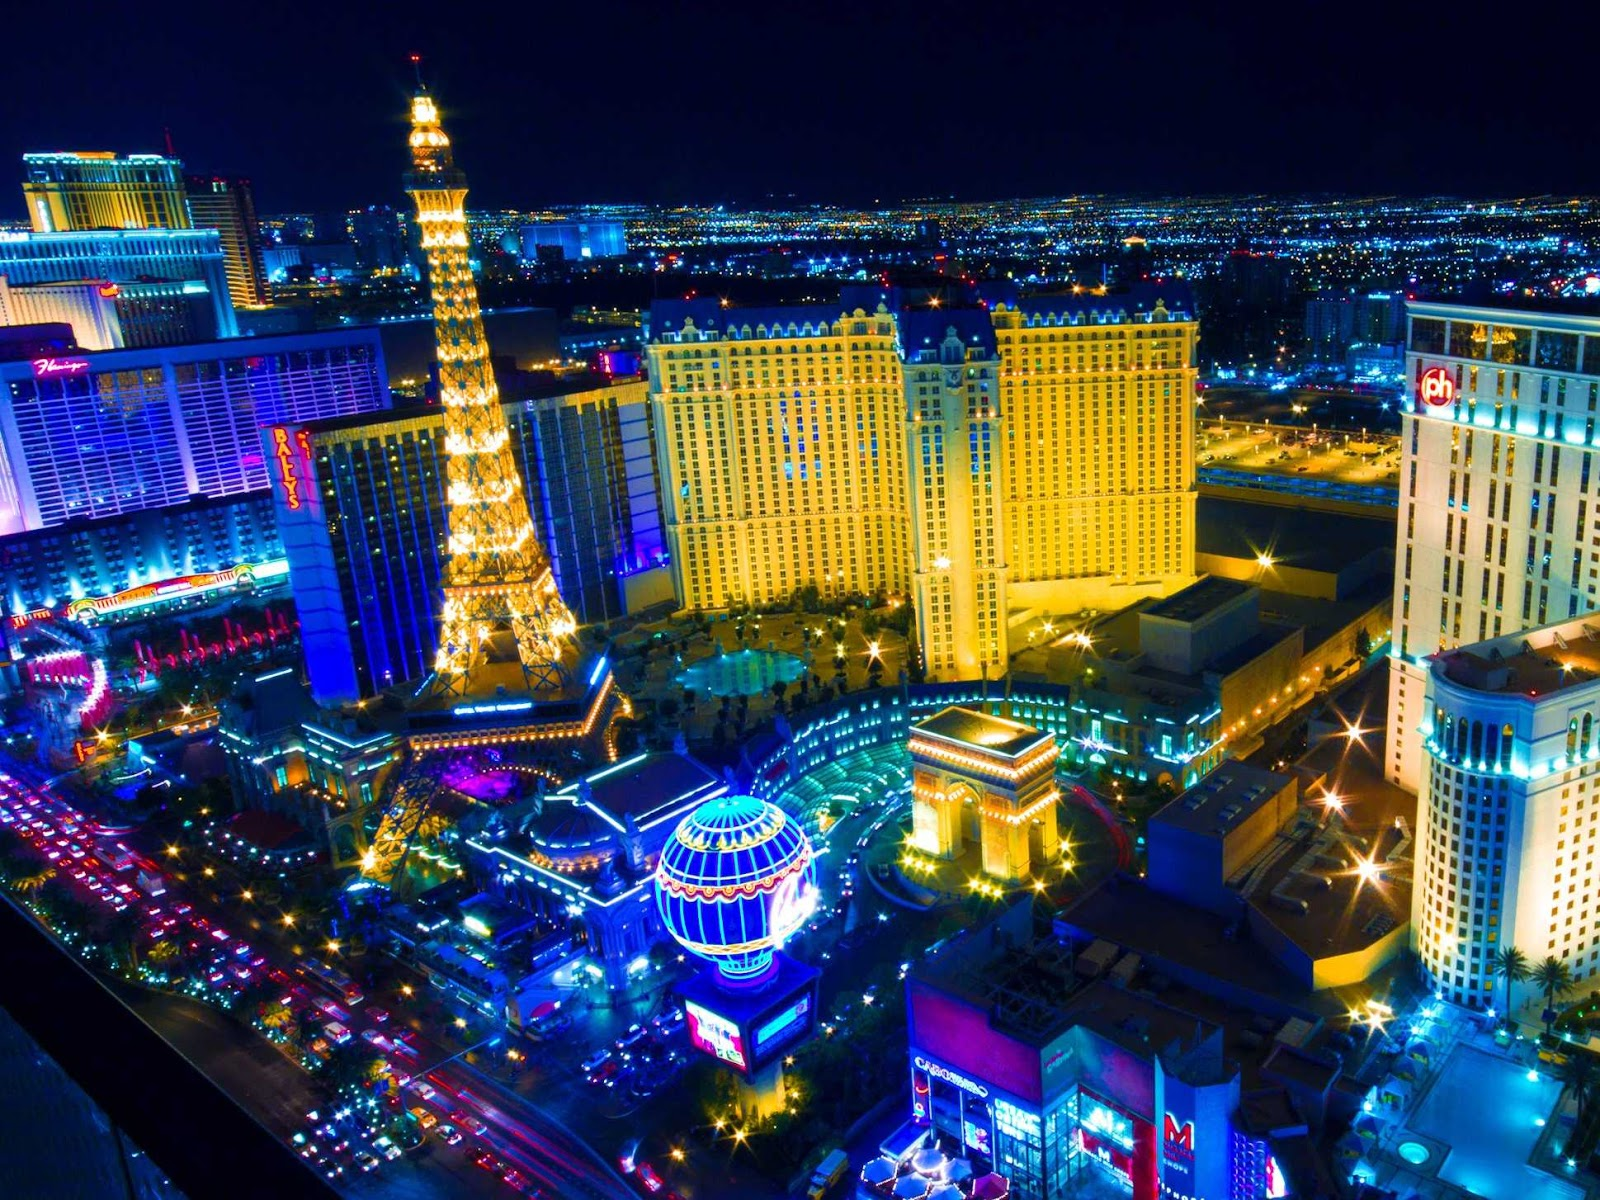 Kitchen Remodel Las Vegas Reclaim Paint Cabinets 专家们说 拉斯维加斯las 新屋市场强劲 厨房改造拉斯维加斯